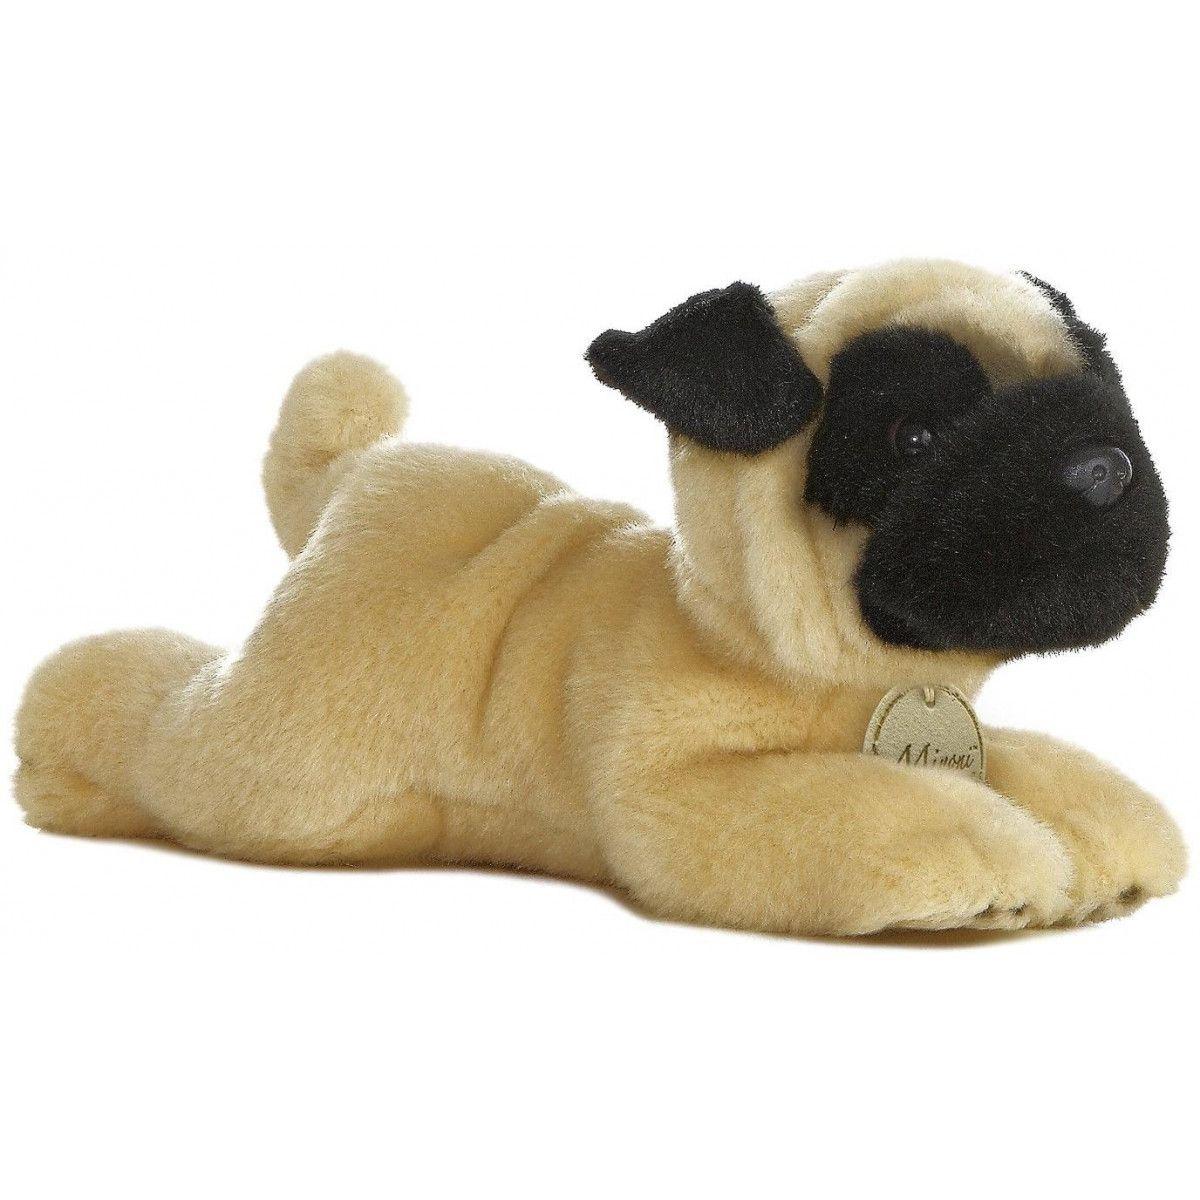 Aurora MiYoni Pug Plush dog, Teddy bear stuffed animal